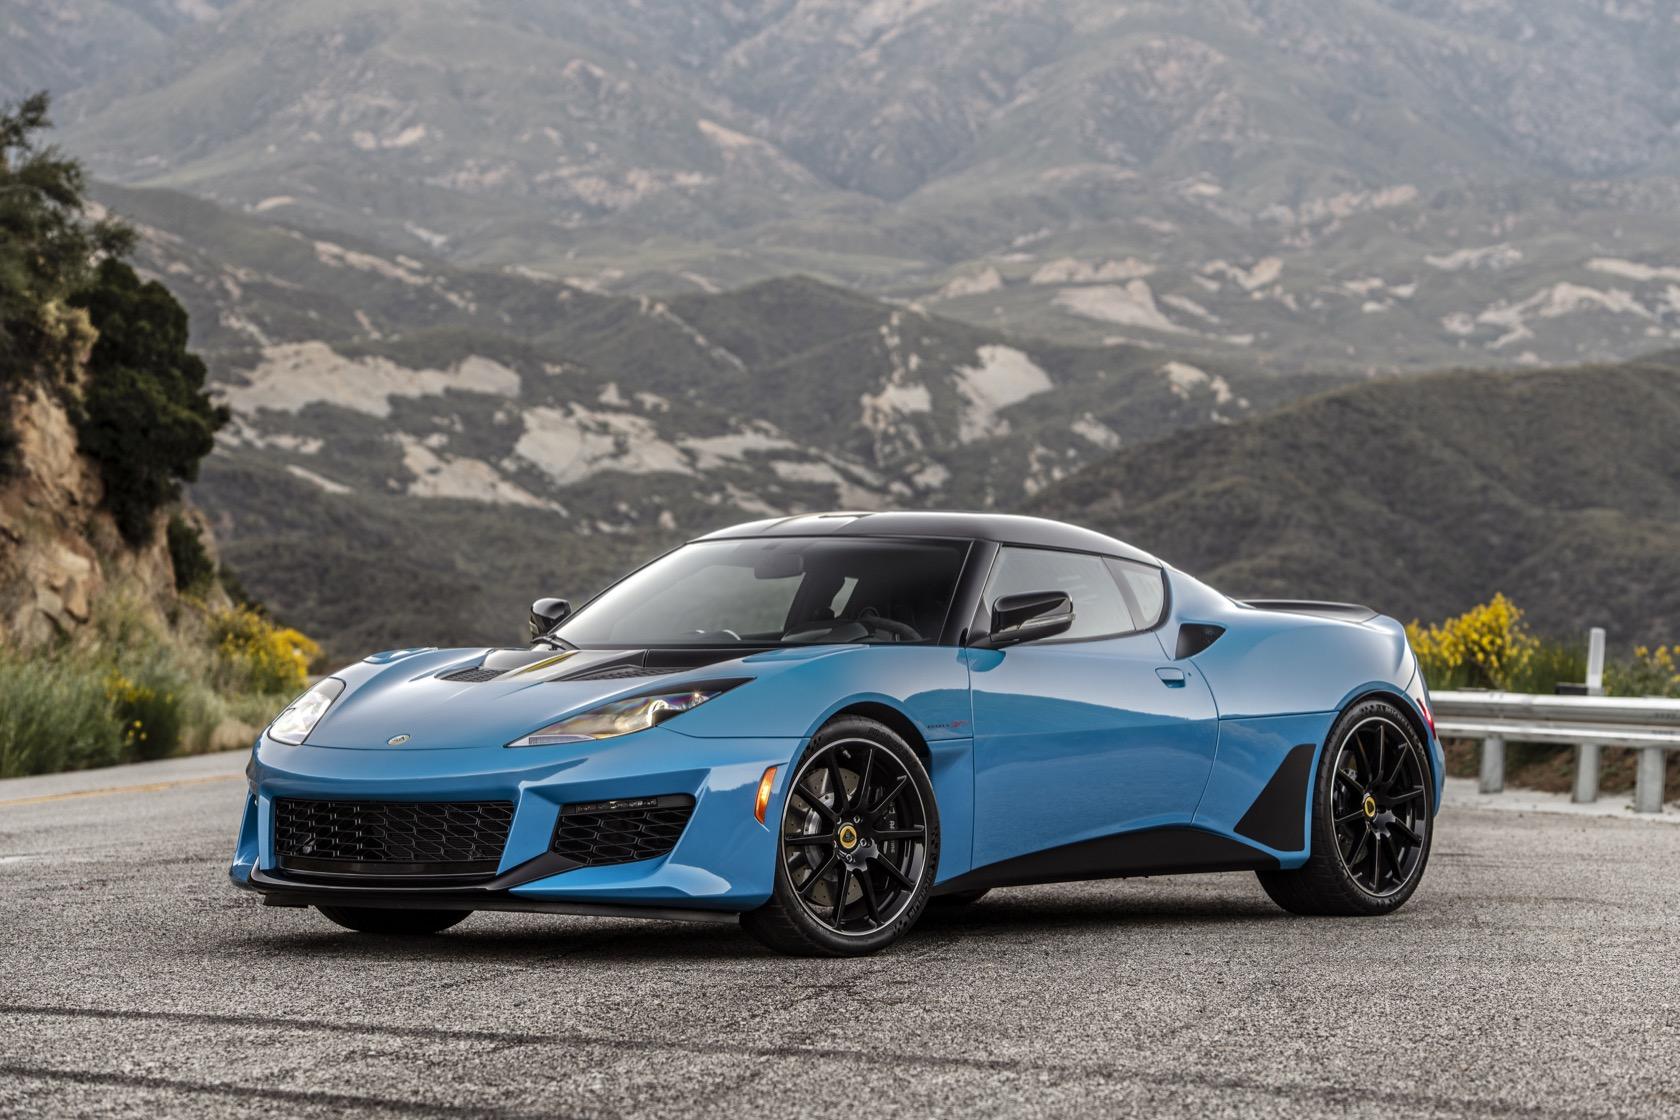 The 2020 Lotus Evora GT has one big advantage over the Evija hypercar -  SlashGear